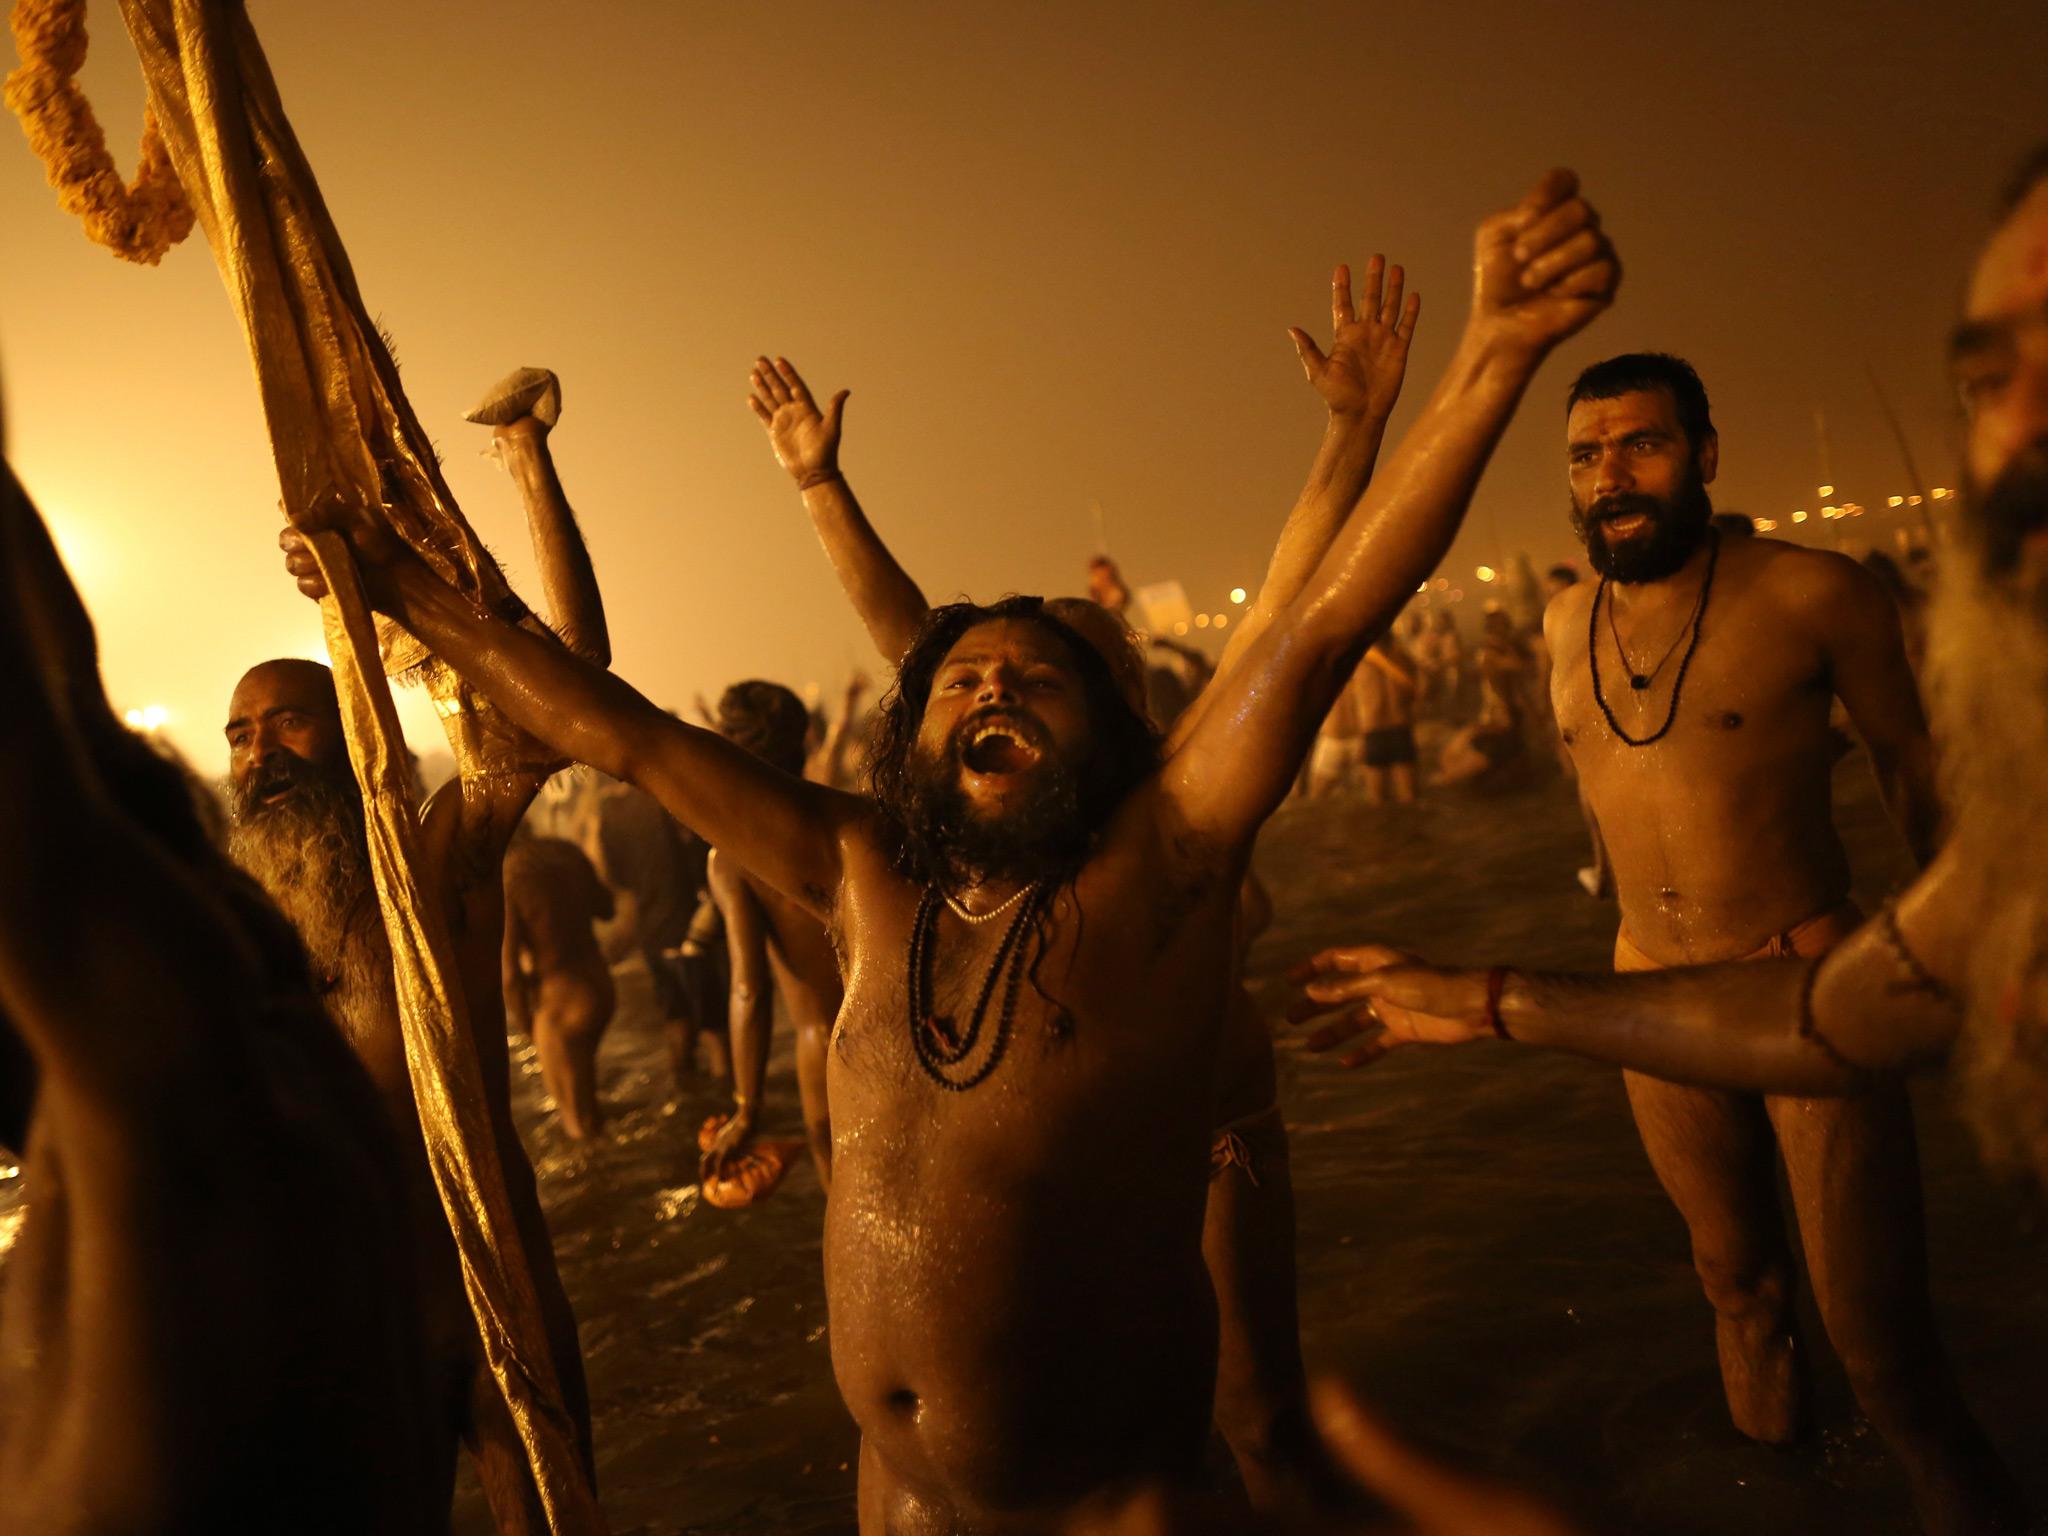 Indian holy men celebrate 005